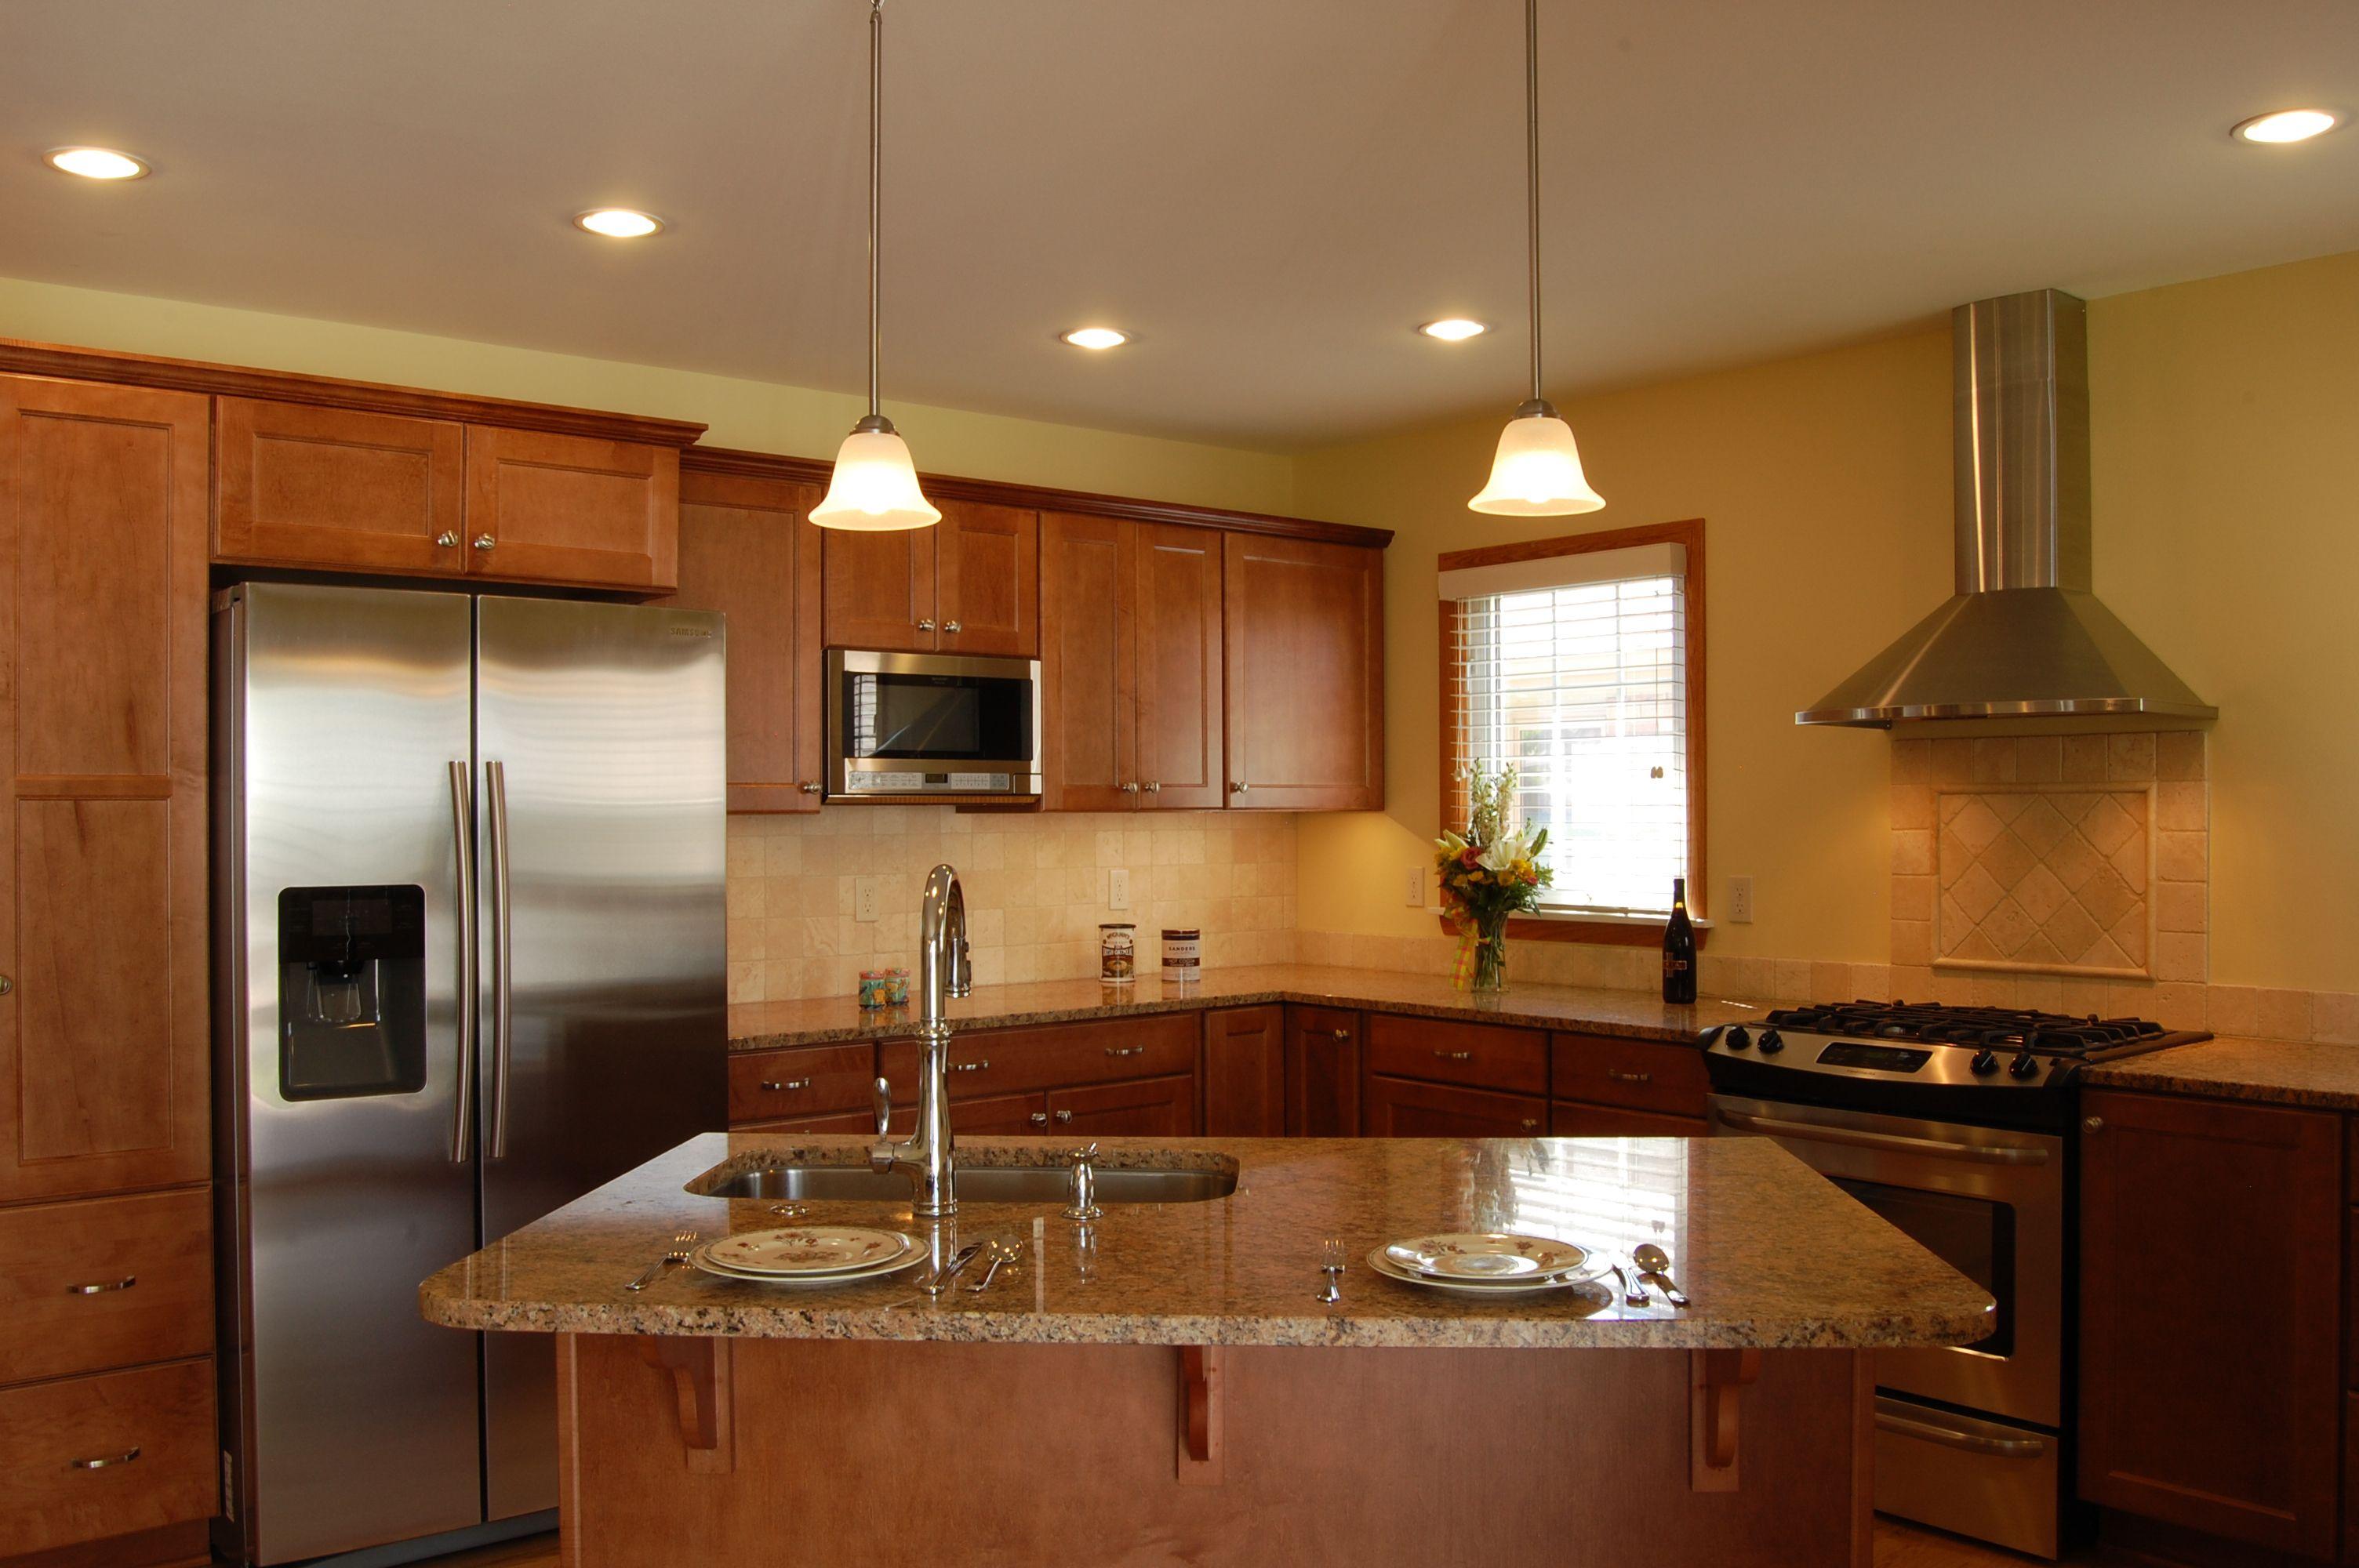 Kitchen Remodel - Wauwatosa, WI by Klassen Remodeling ...